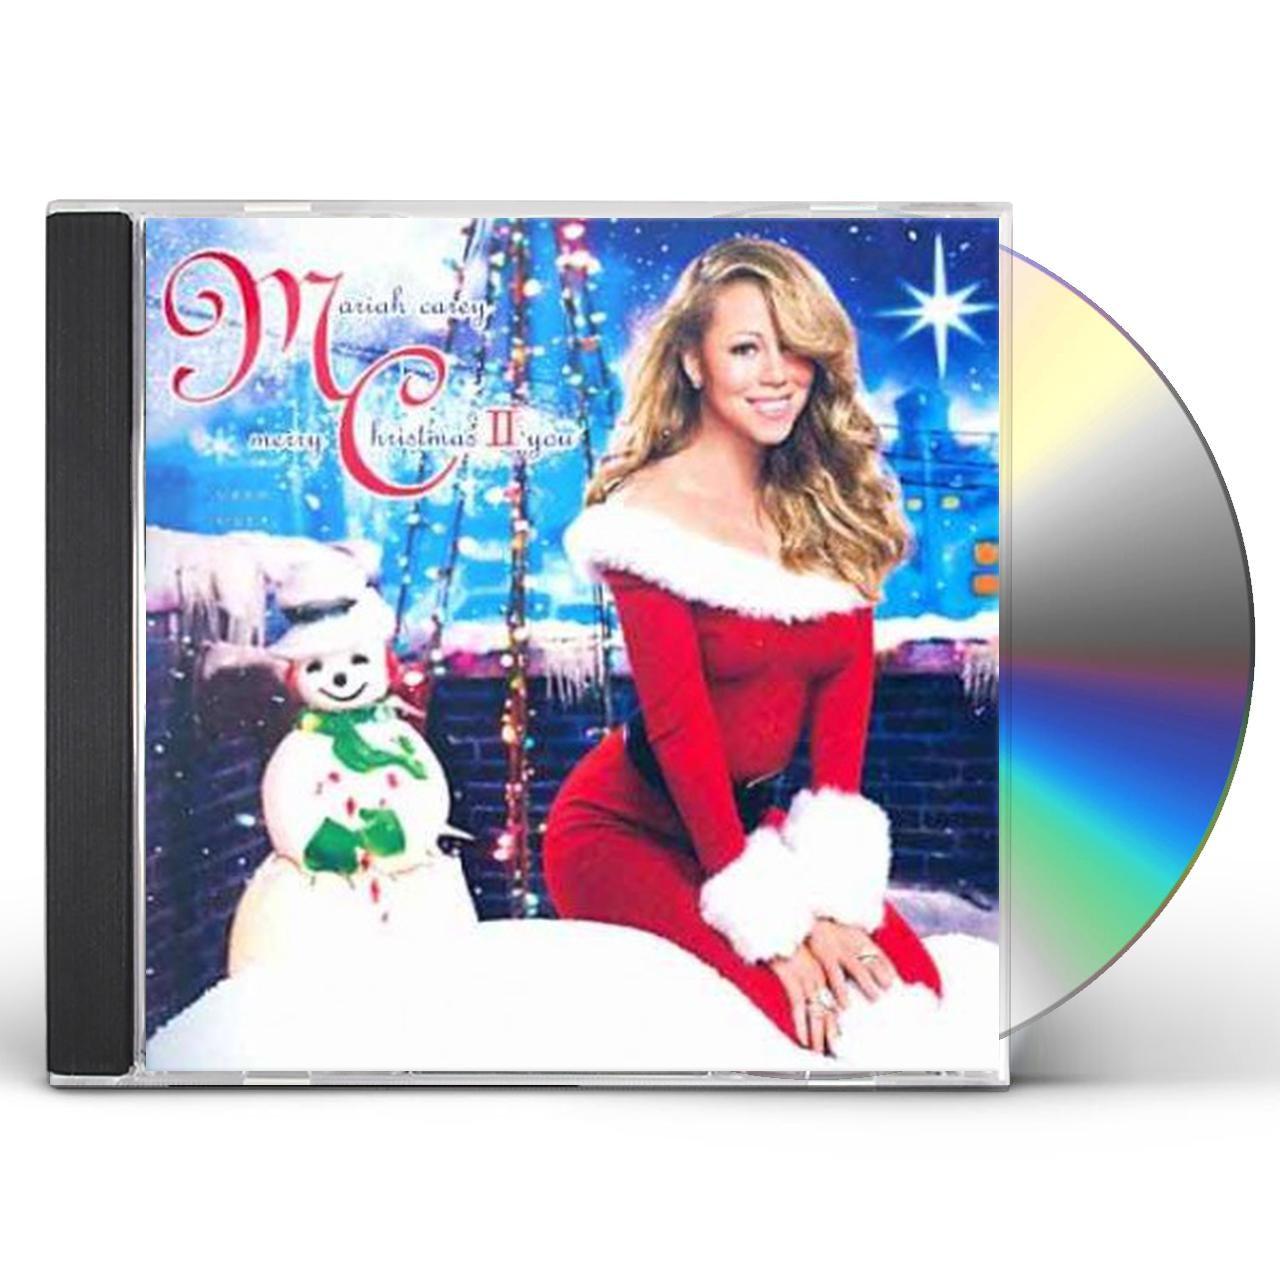 Mariah Carey Christmas Album Cover.Mariah Carey Merry Christmas Ii You Cd